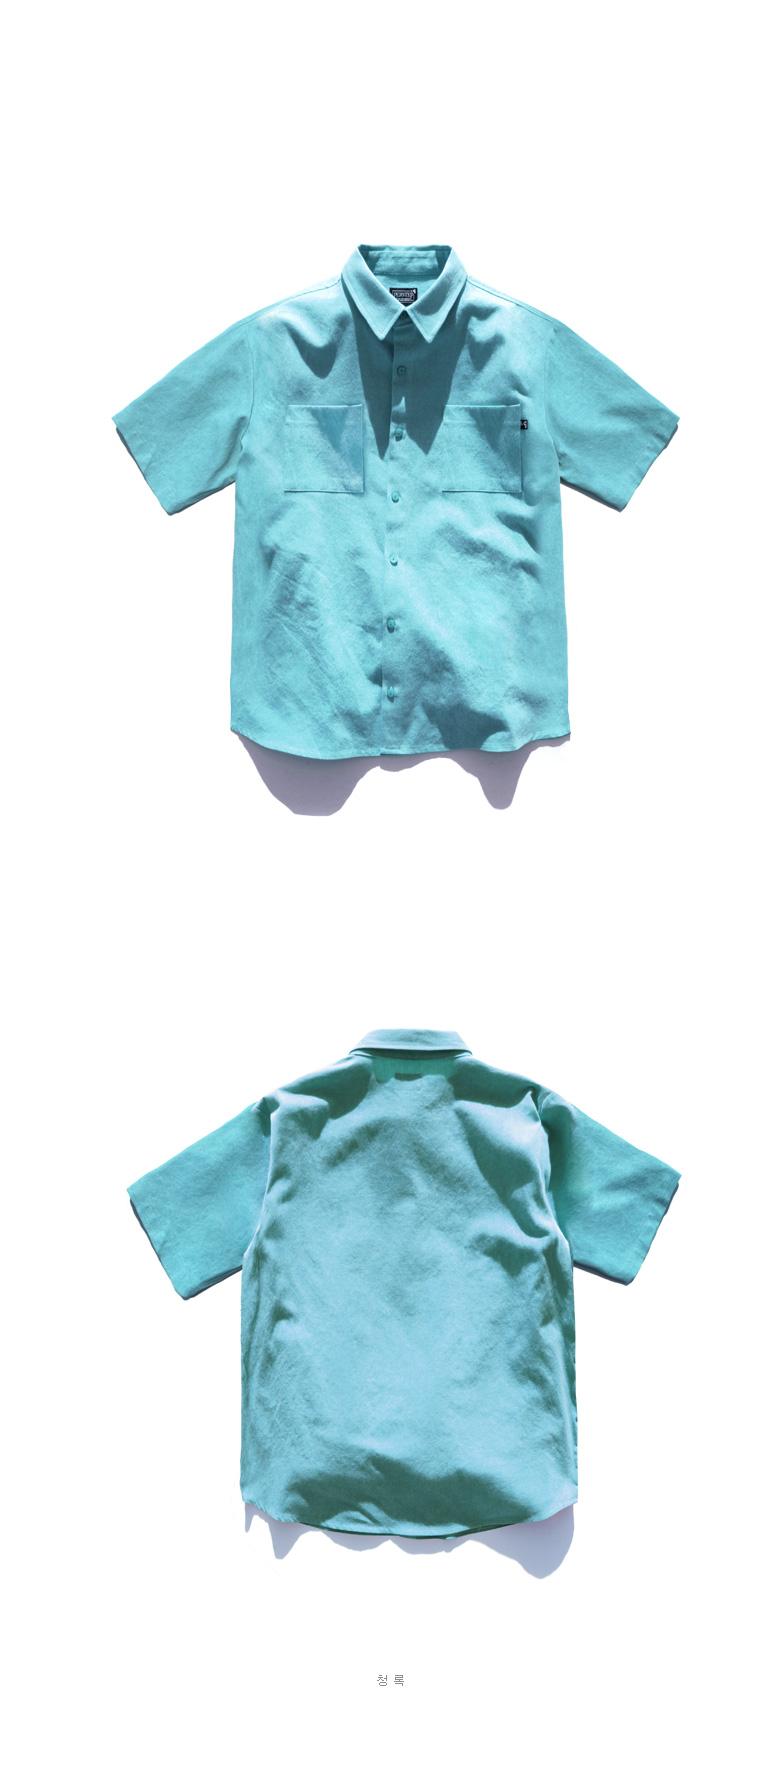 20170517_ps_pigment_short_bluegreen_ms_01.jpg